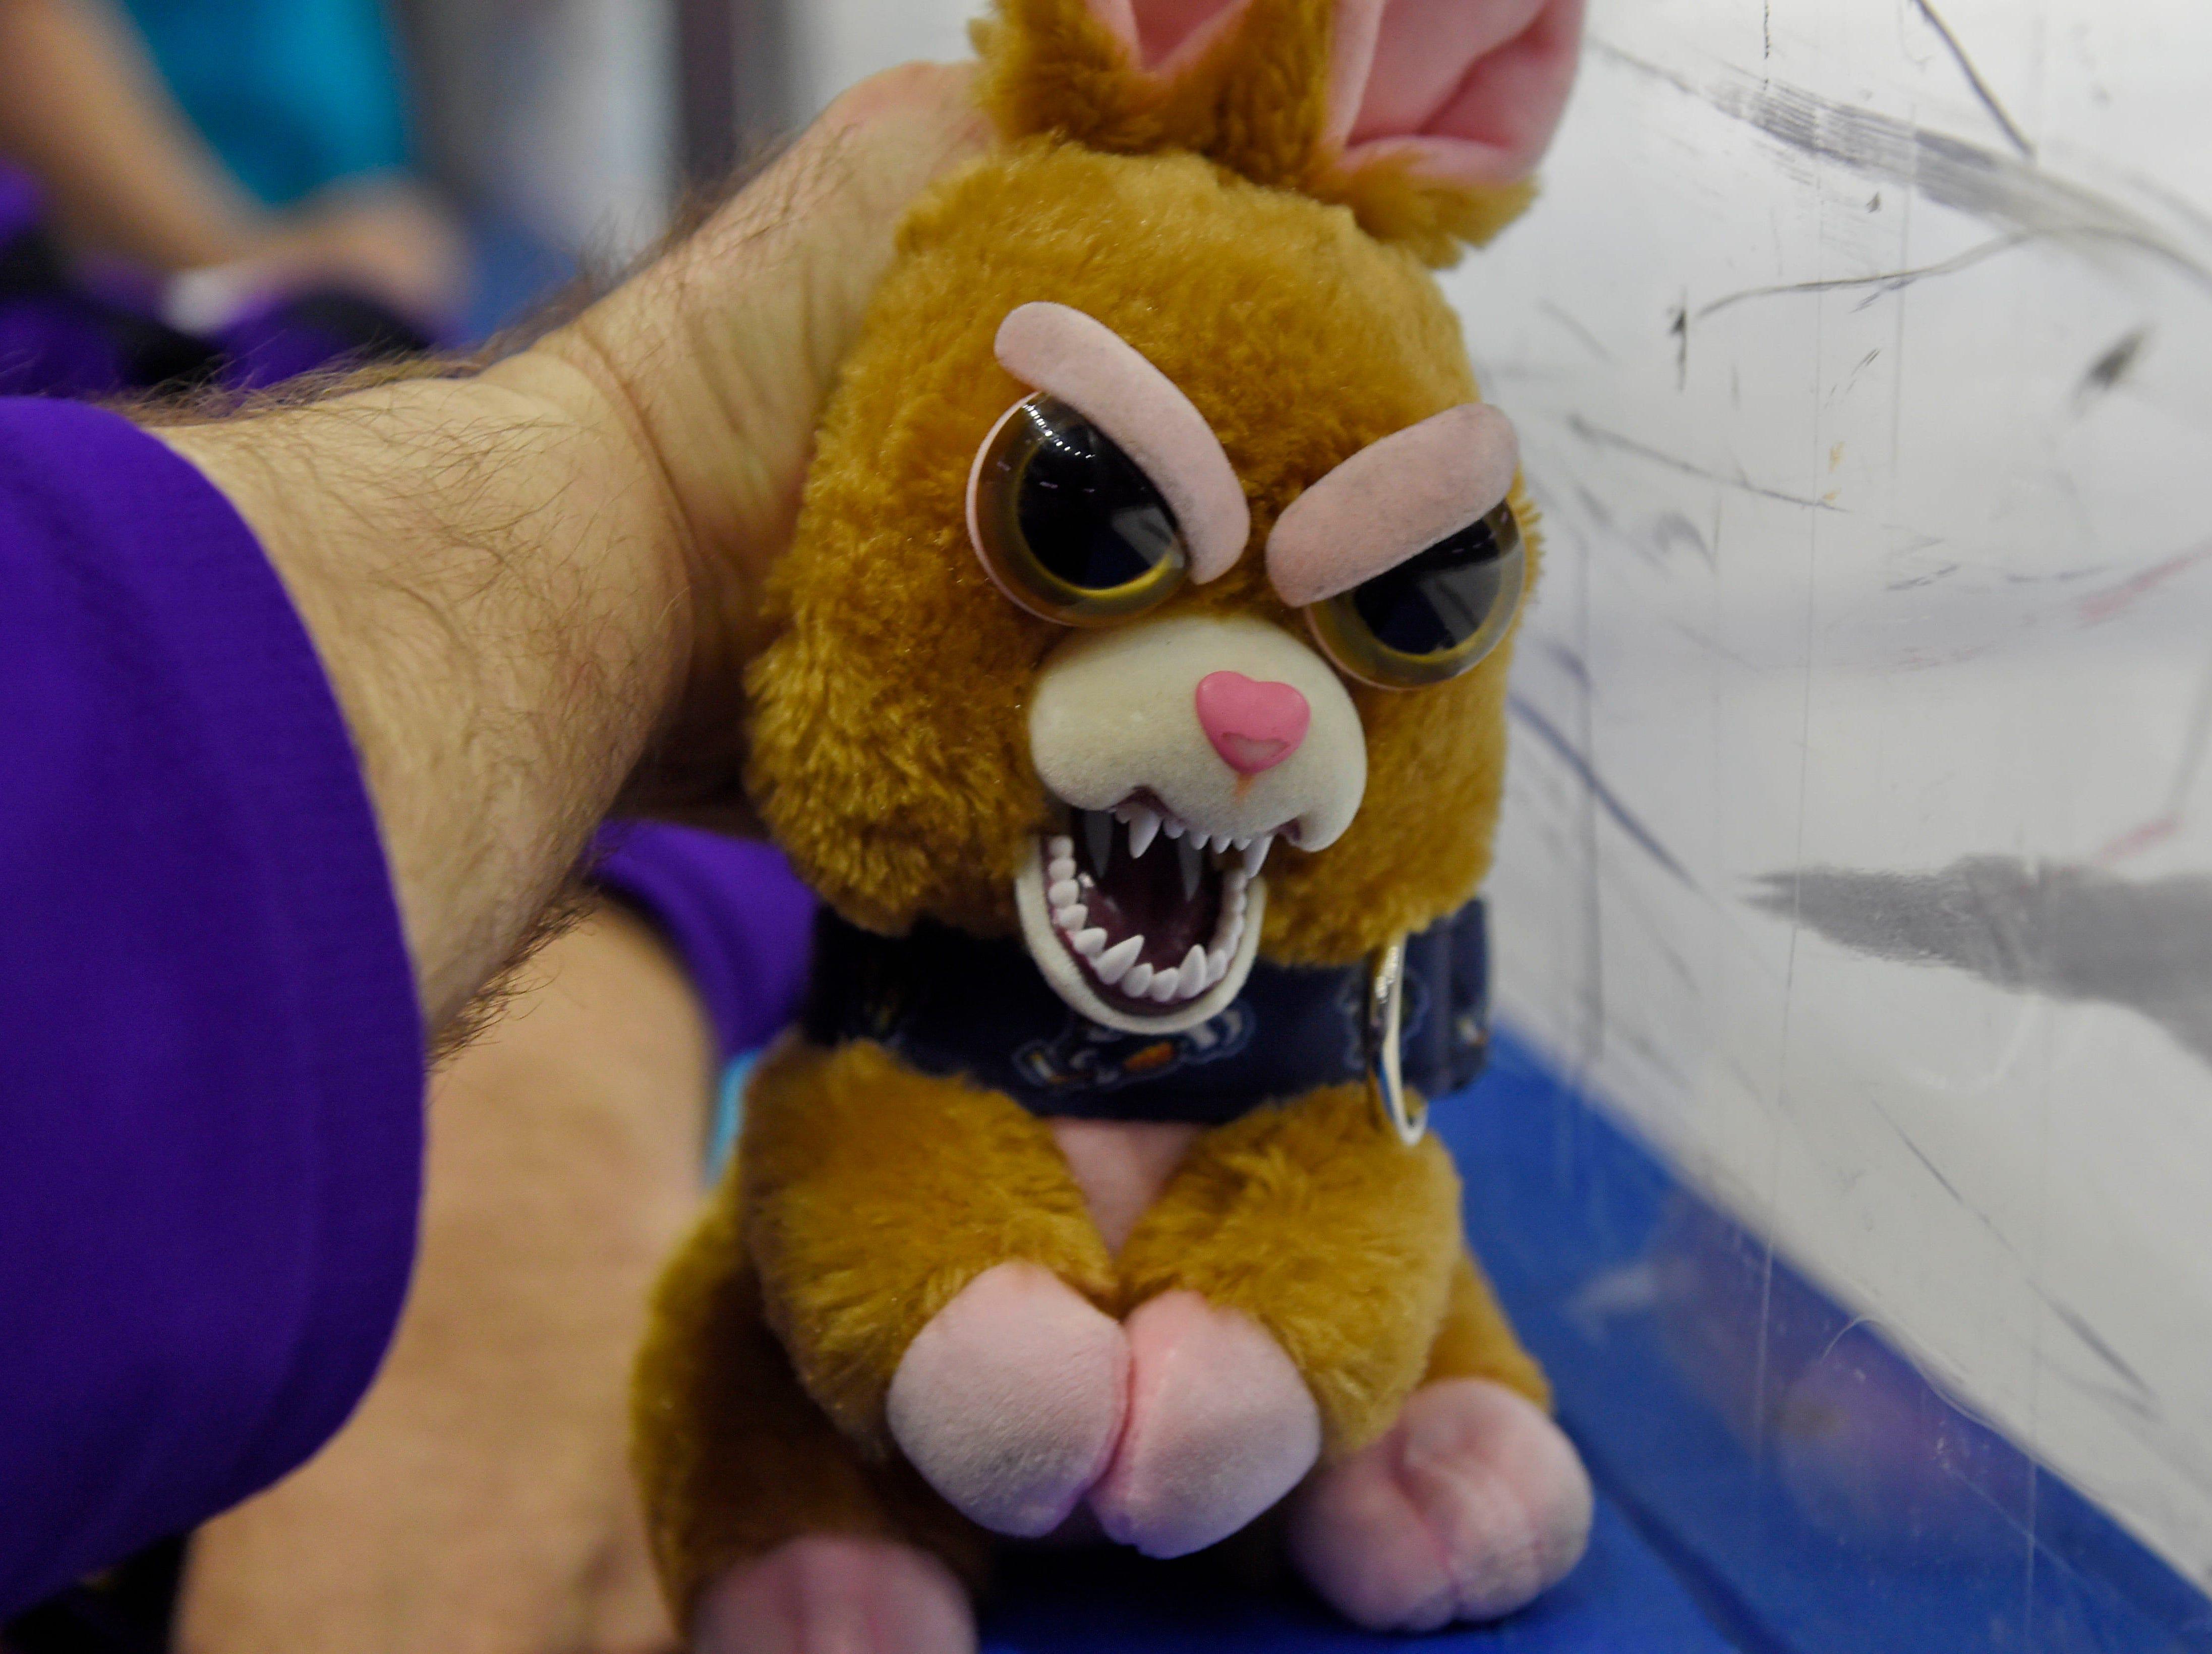 The Greenville Swamp Rabbits held their annual Teddy Bear Toss Friday, September 7, 2018.